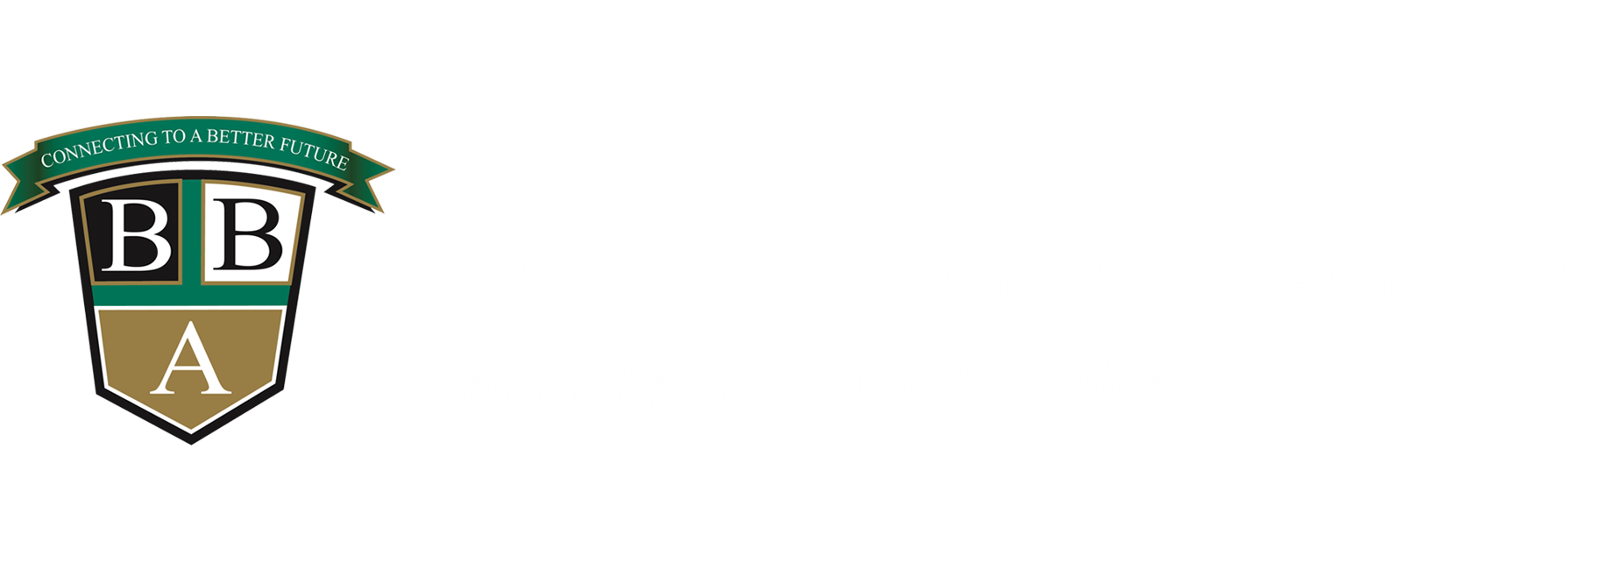 Bergen Blended Academy